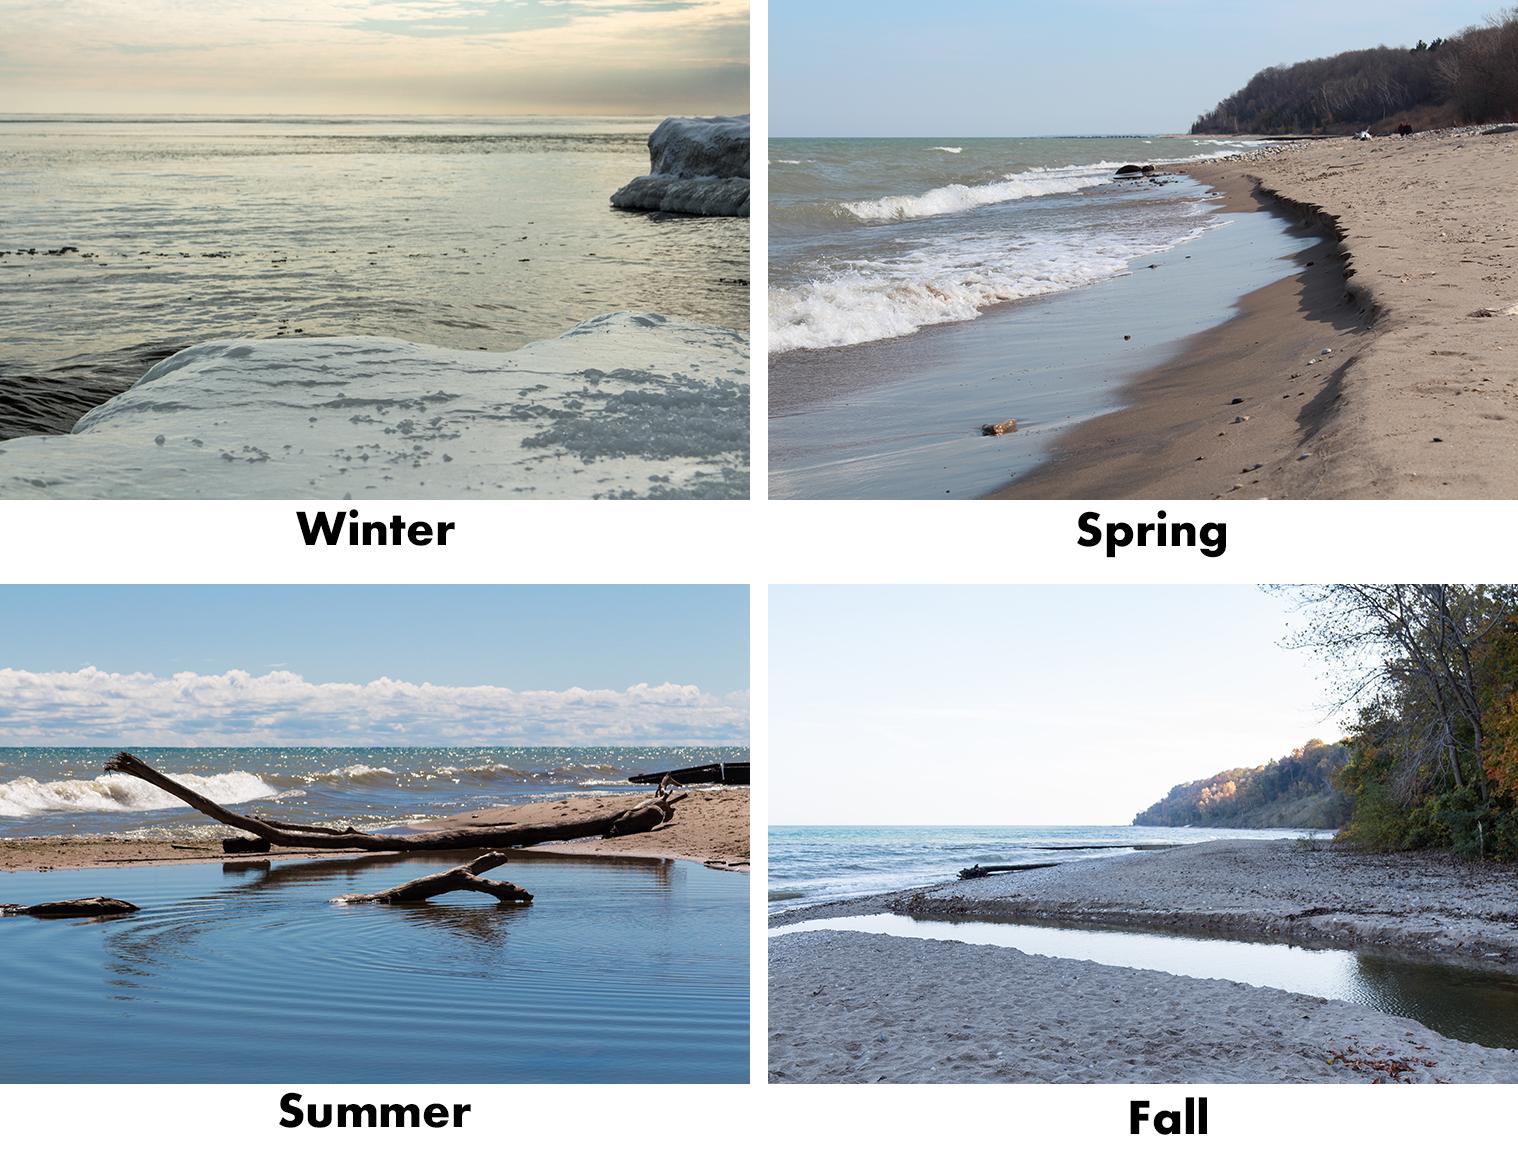 Beach in Four Seasons   http://www.roseclearfield.com